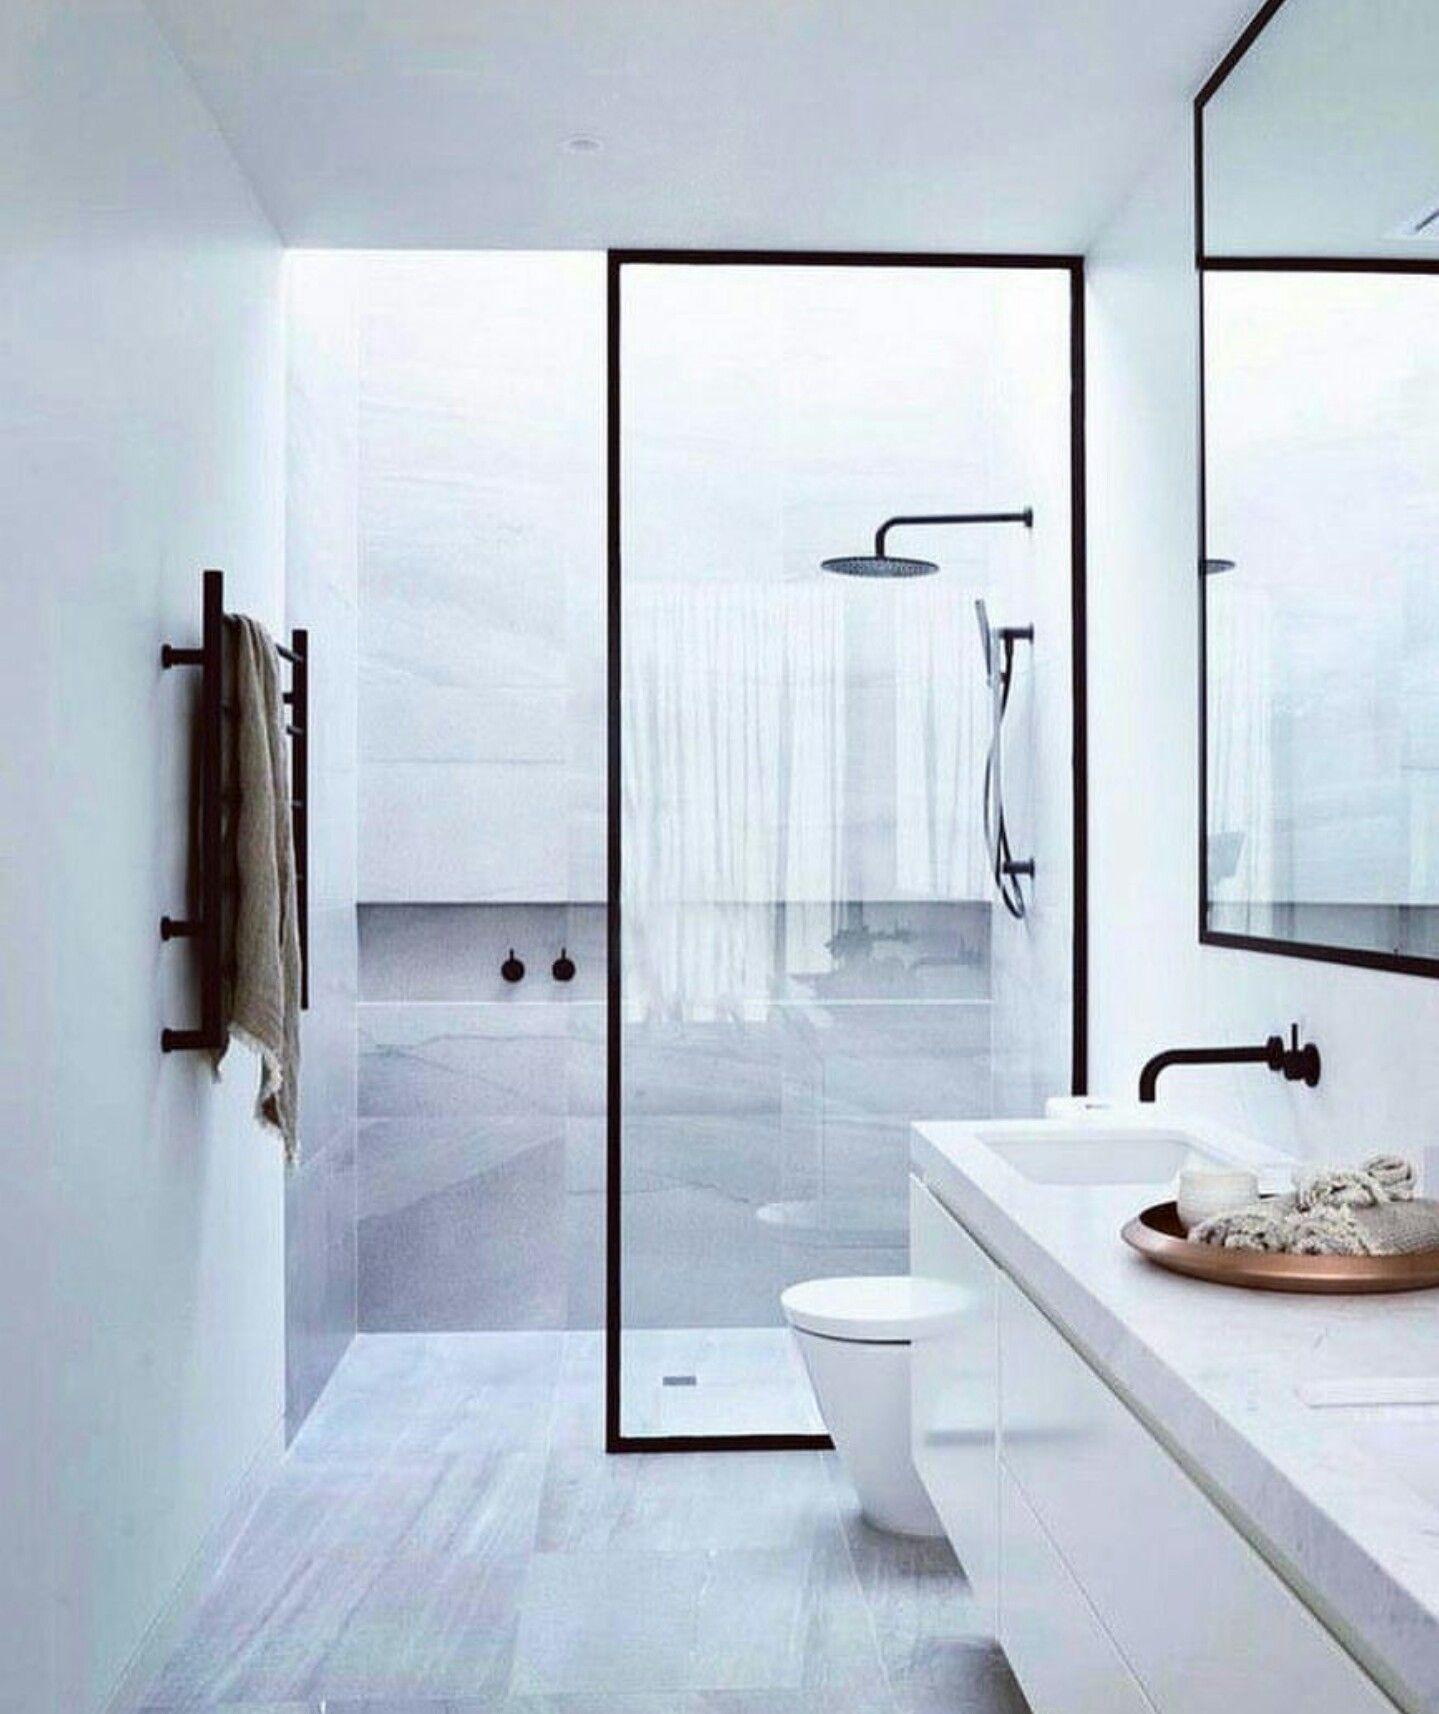 Pin by Christen Kunkler on Home | Pinterest | Washroom and Toilet